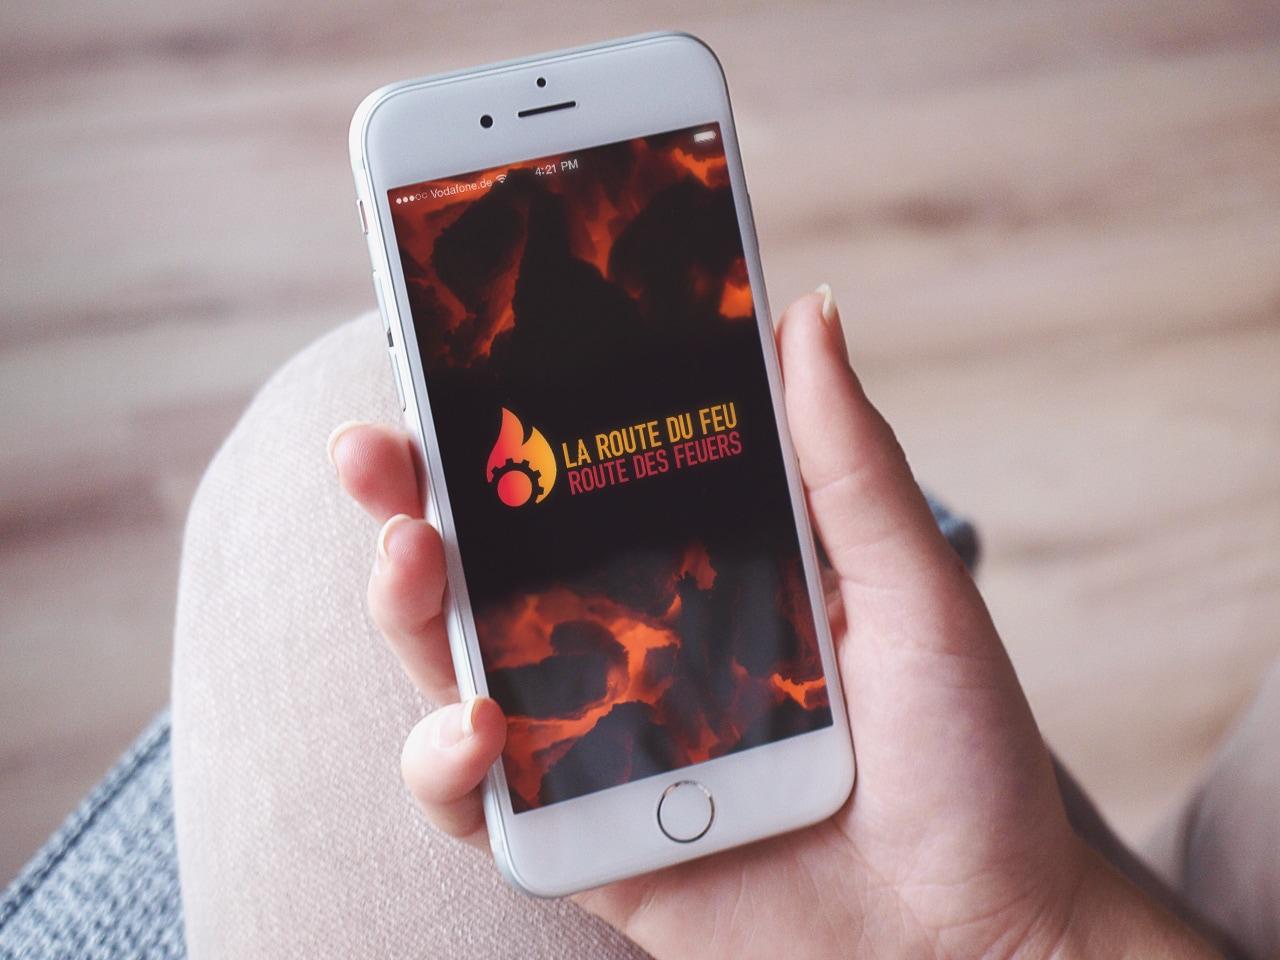 La Route du feu Webseite auf Smartphone